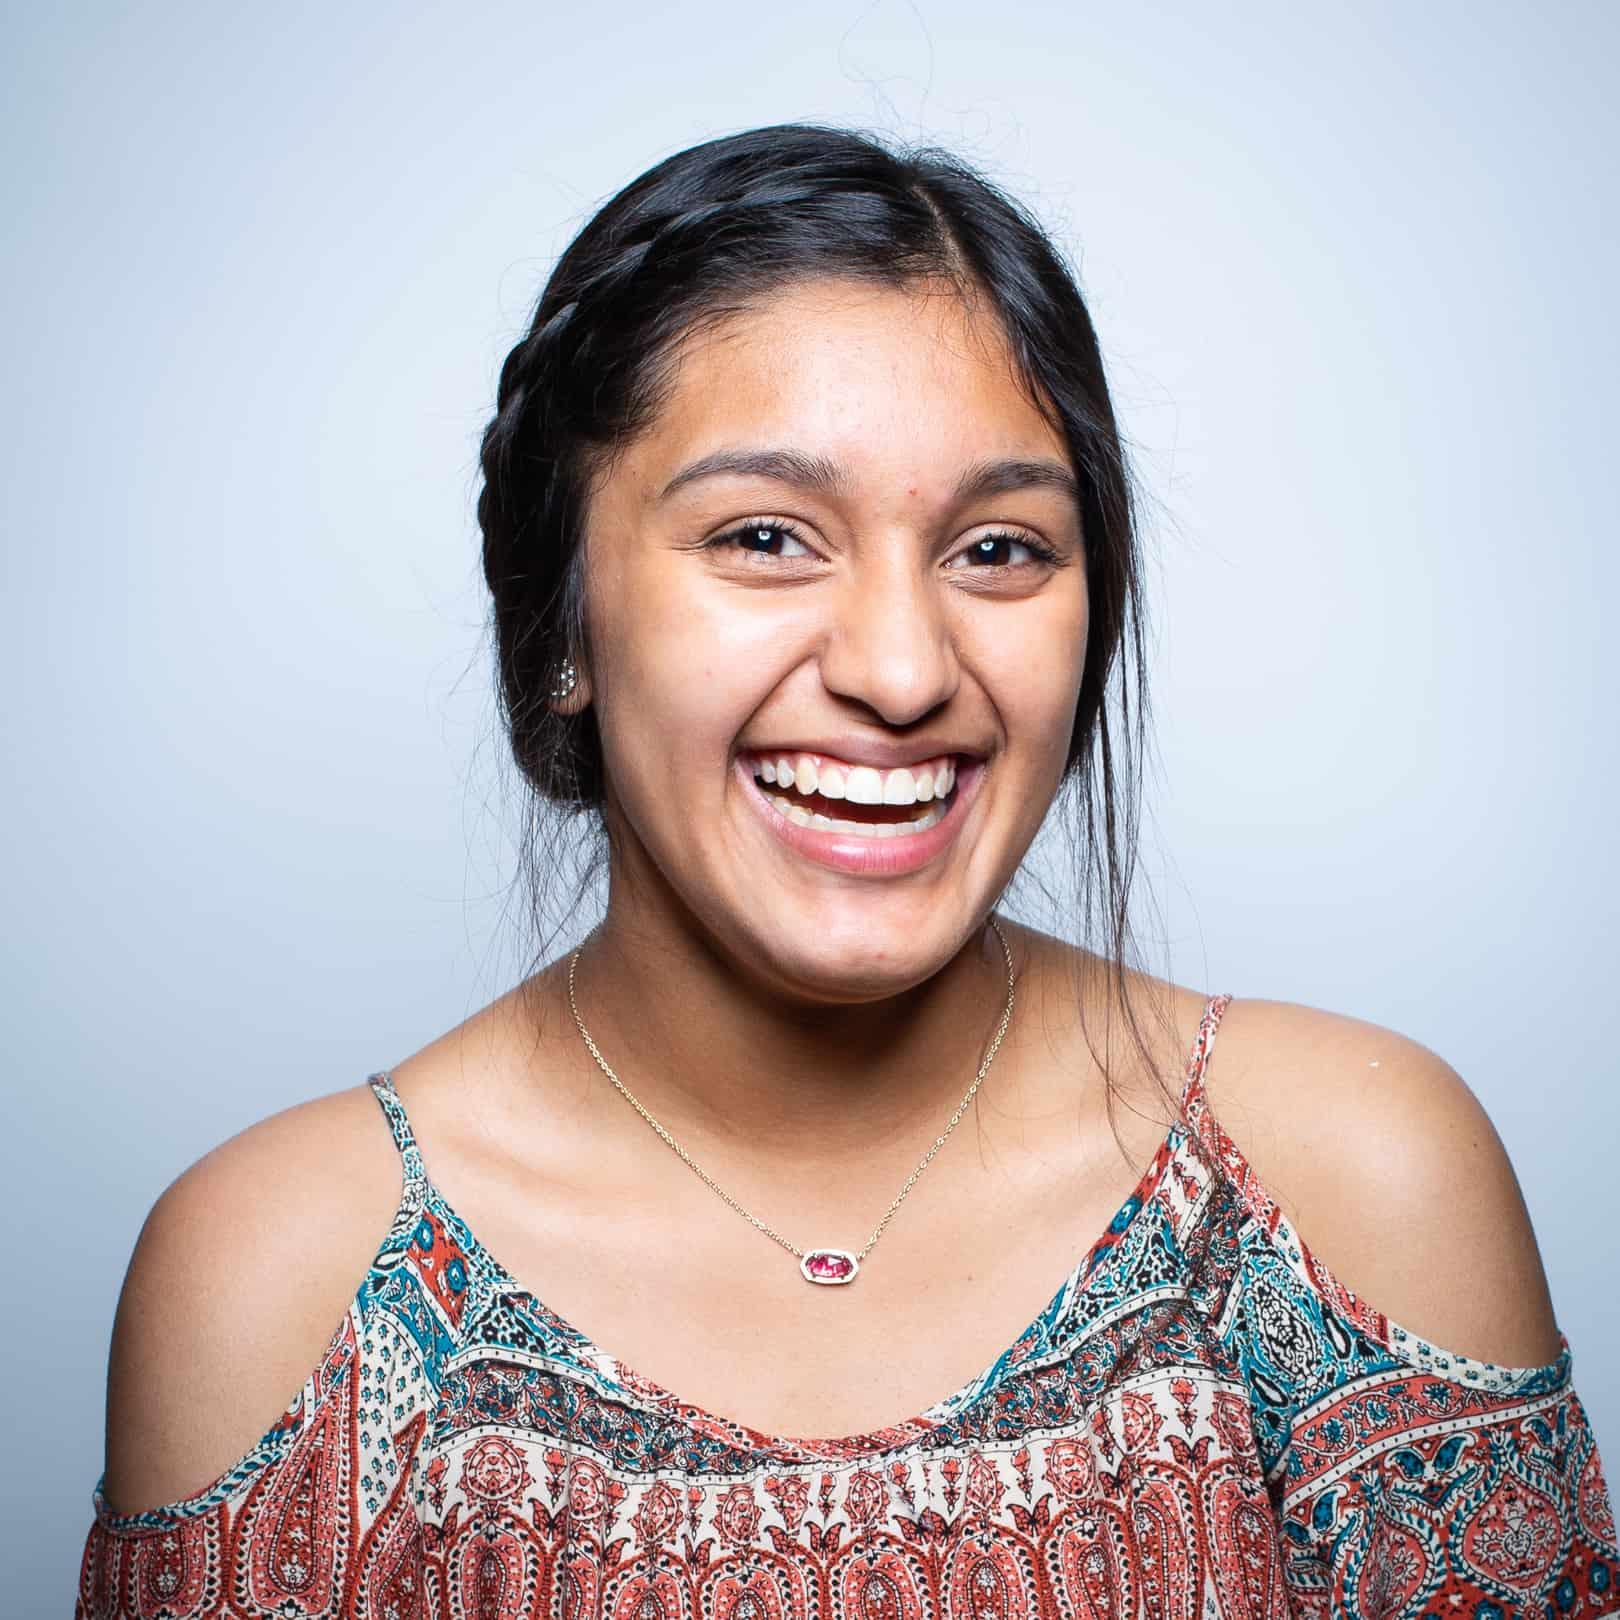 Reuland Orthodontics Patient Portraits 2 - Our Beautiful Smiles